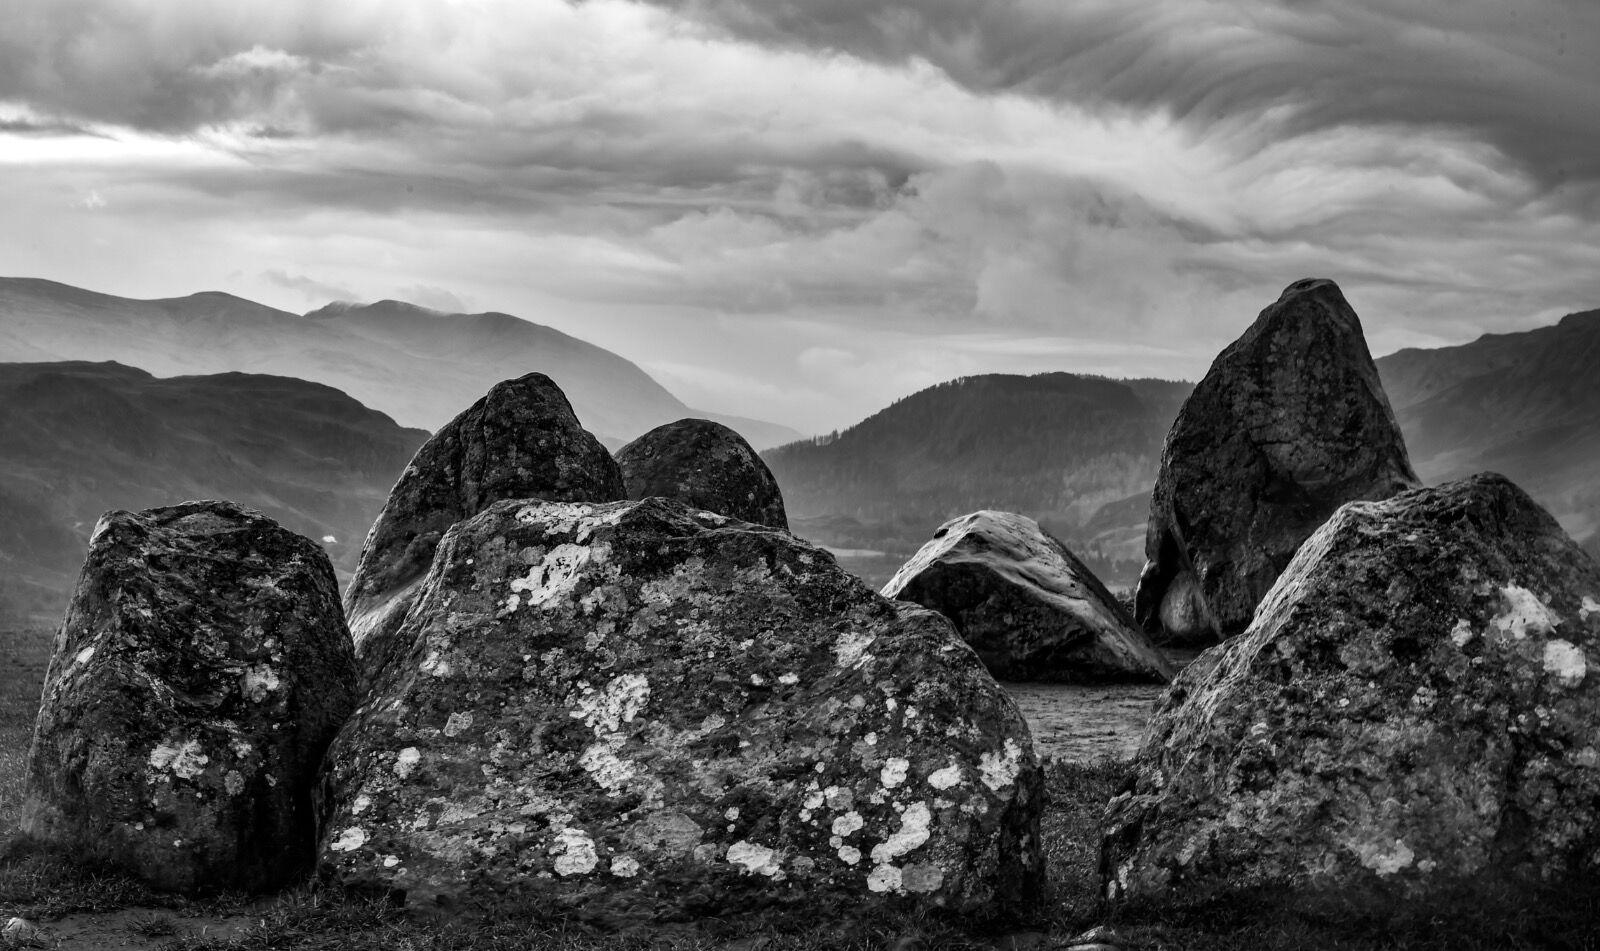 Mystery of Castlerigg Stone Circle on Halloween